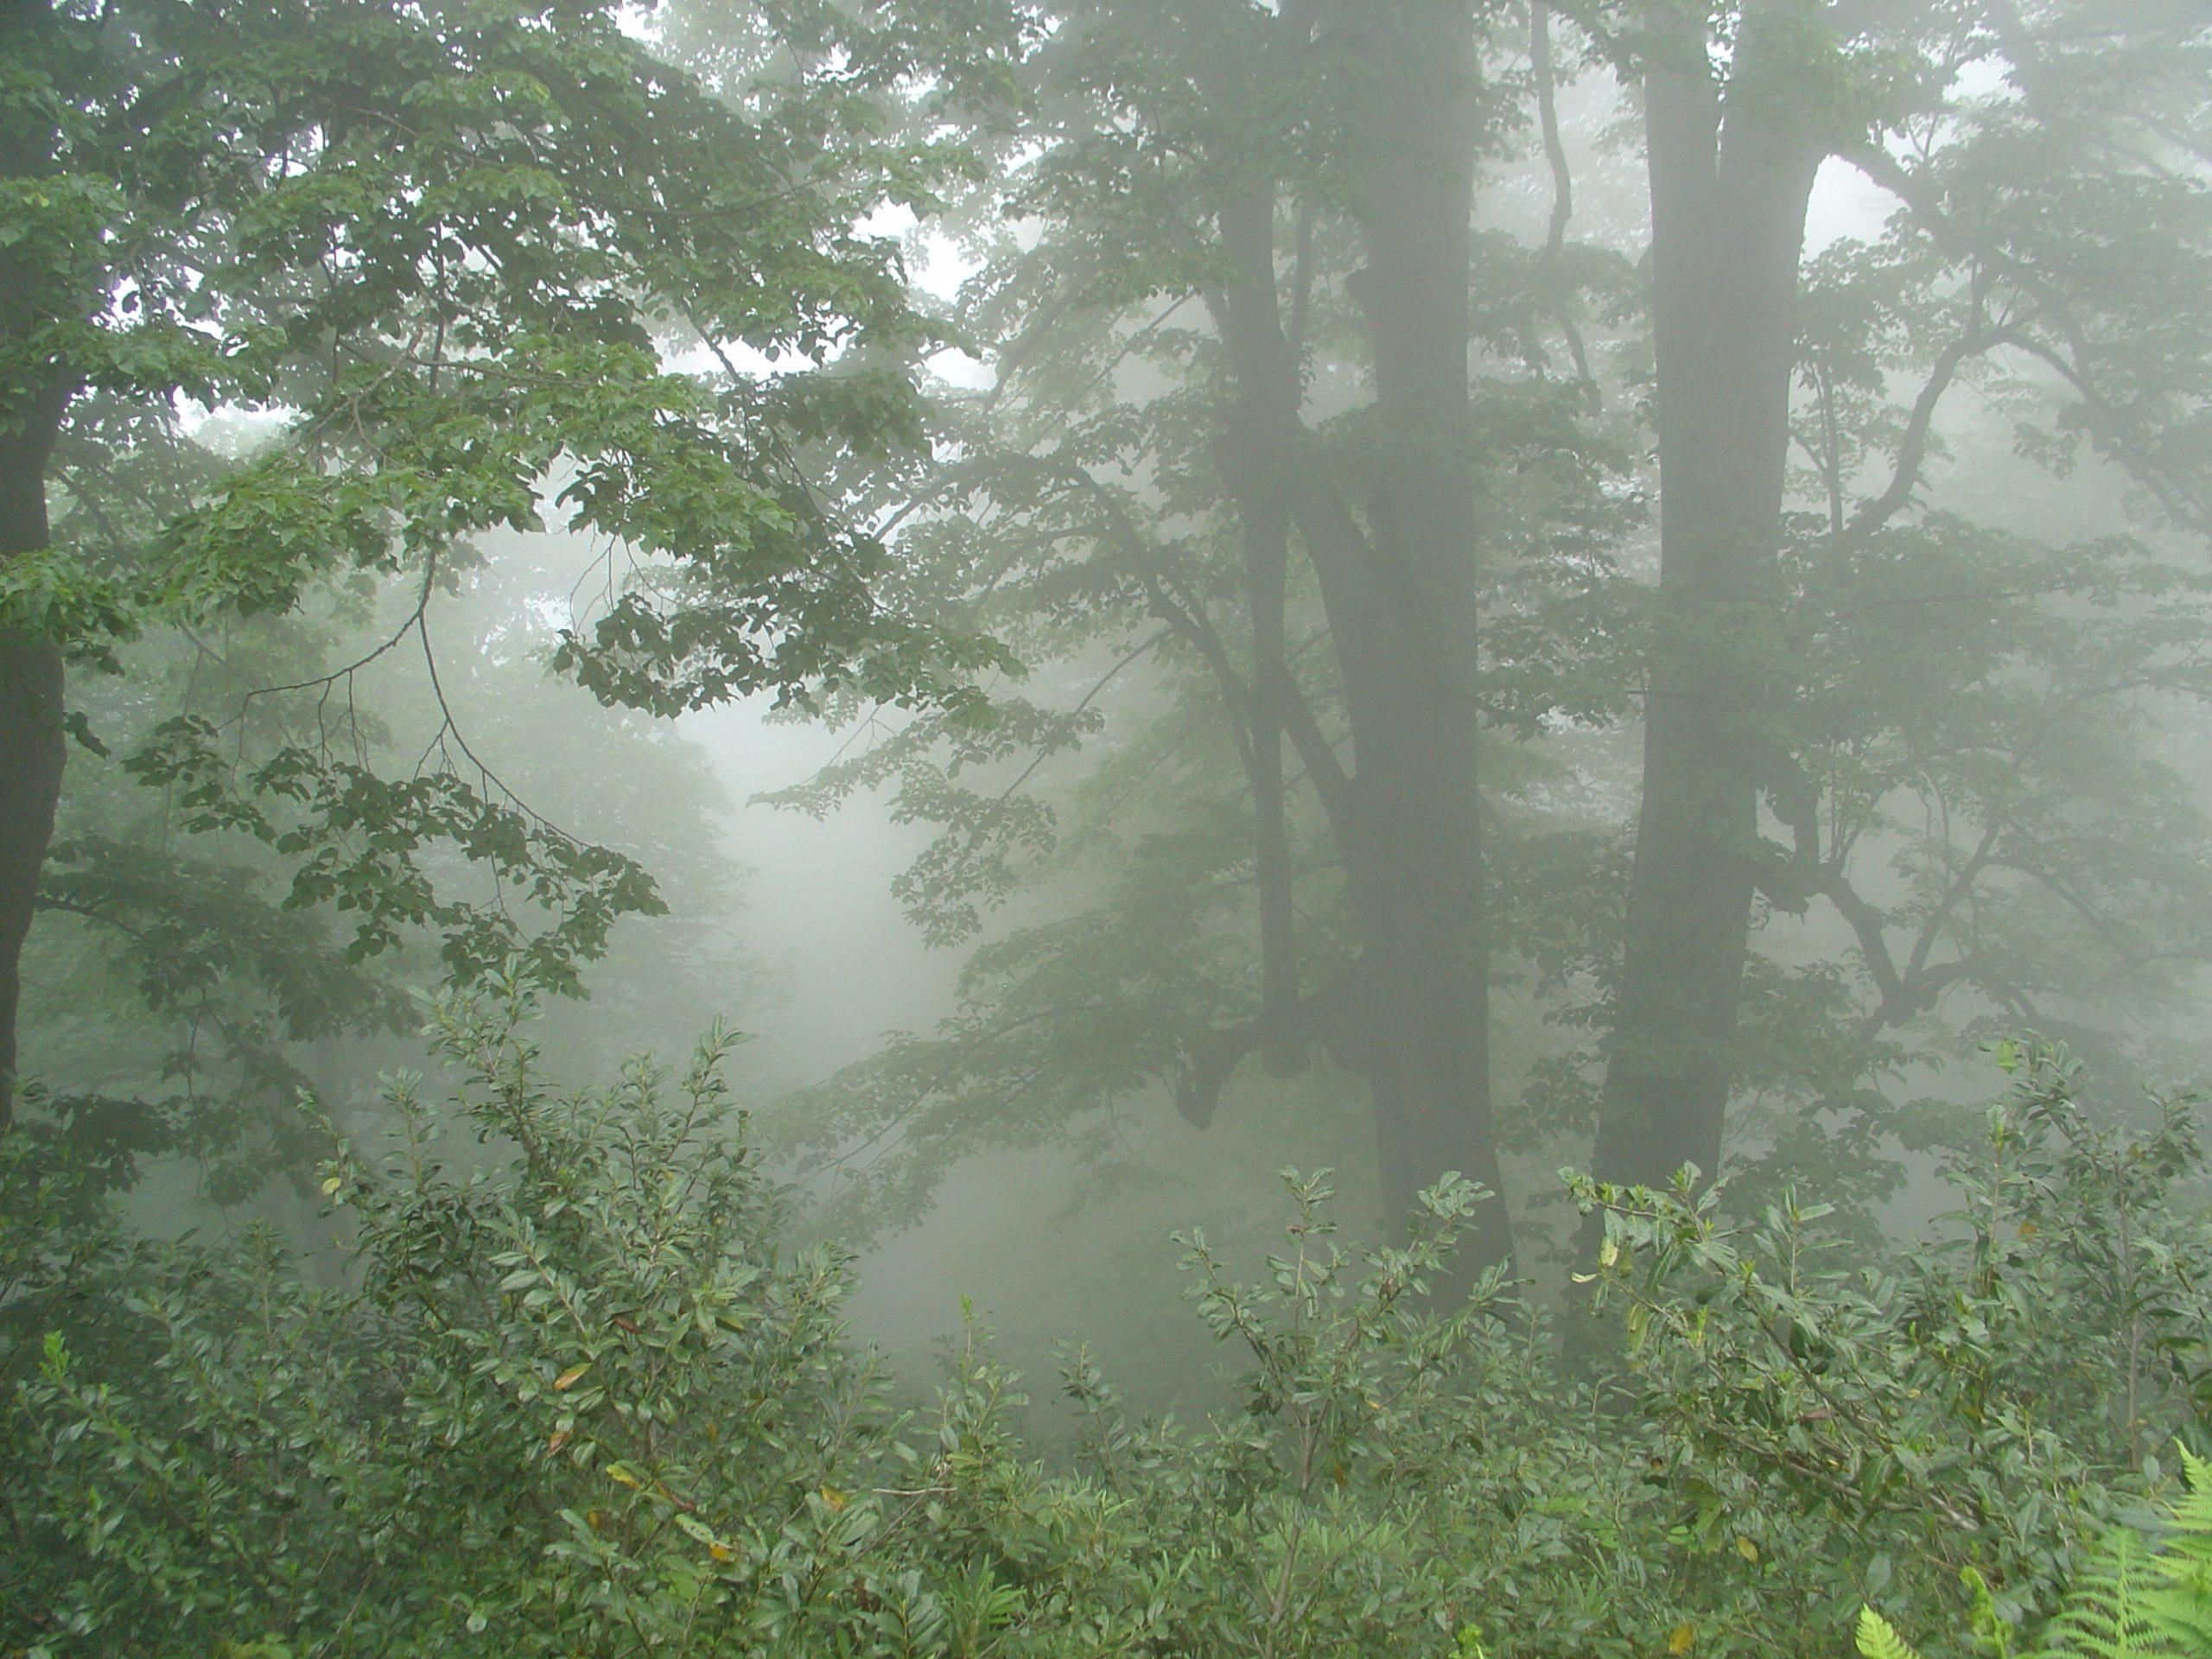 Mtirala National Park. Colchic broad-leaved mixed forest. 06/2004 Photographer & Copyright: Zurab Manvelidze